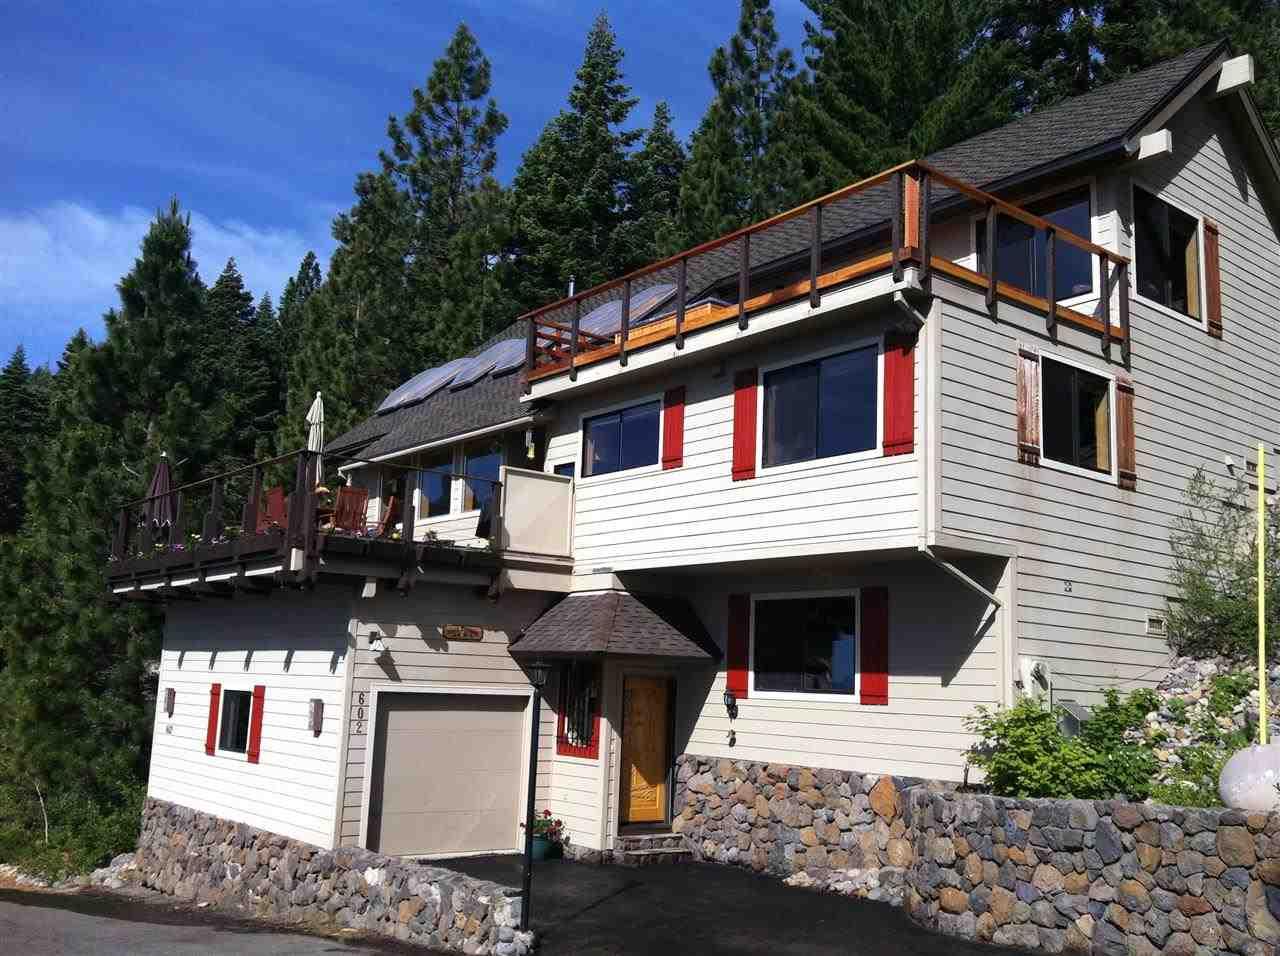 Additional photo for property listing at 602 Sunrise Avenue 602 Sunrise Avenue Tahoma, California 96142 United States